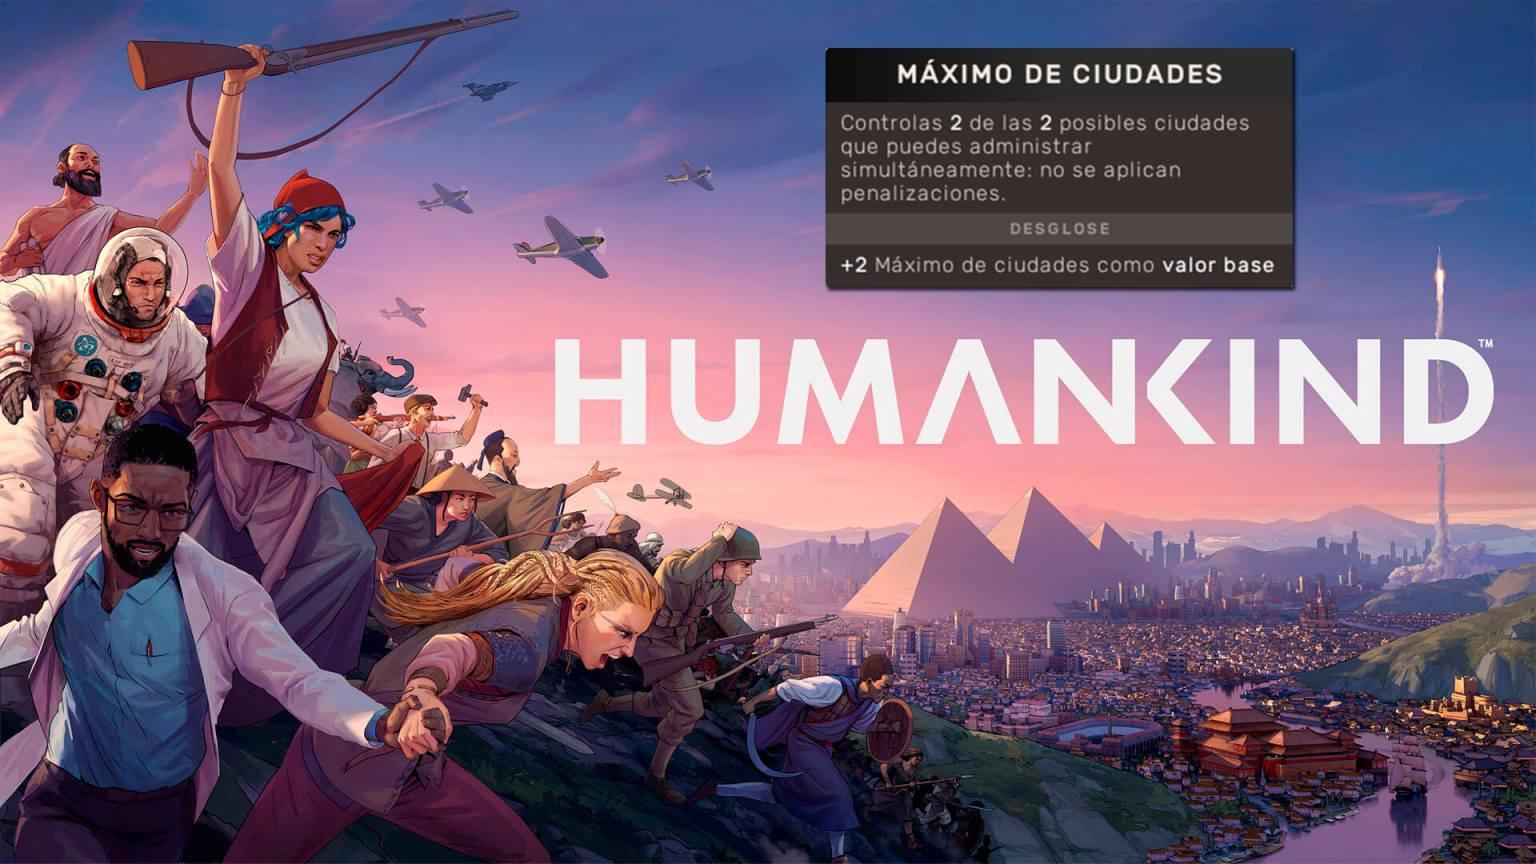 Humankind ciudades